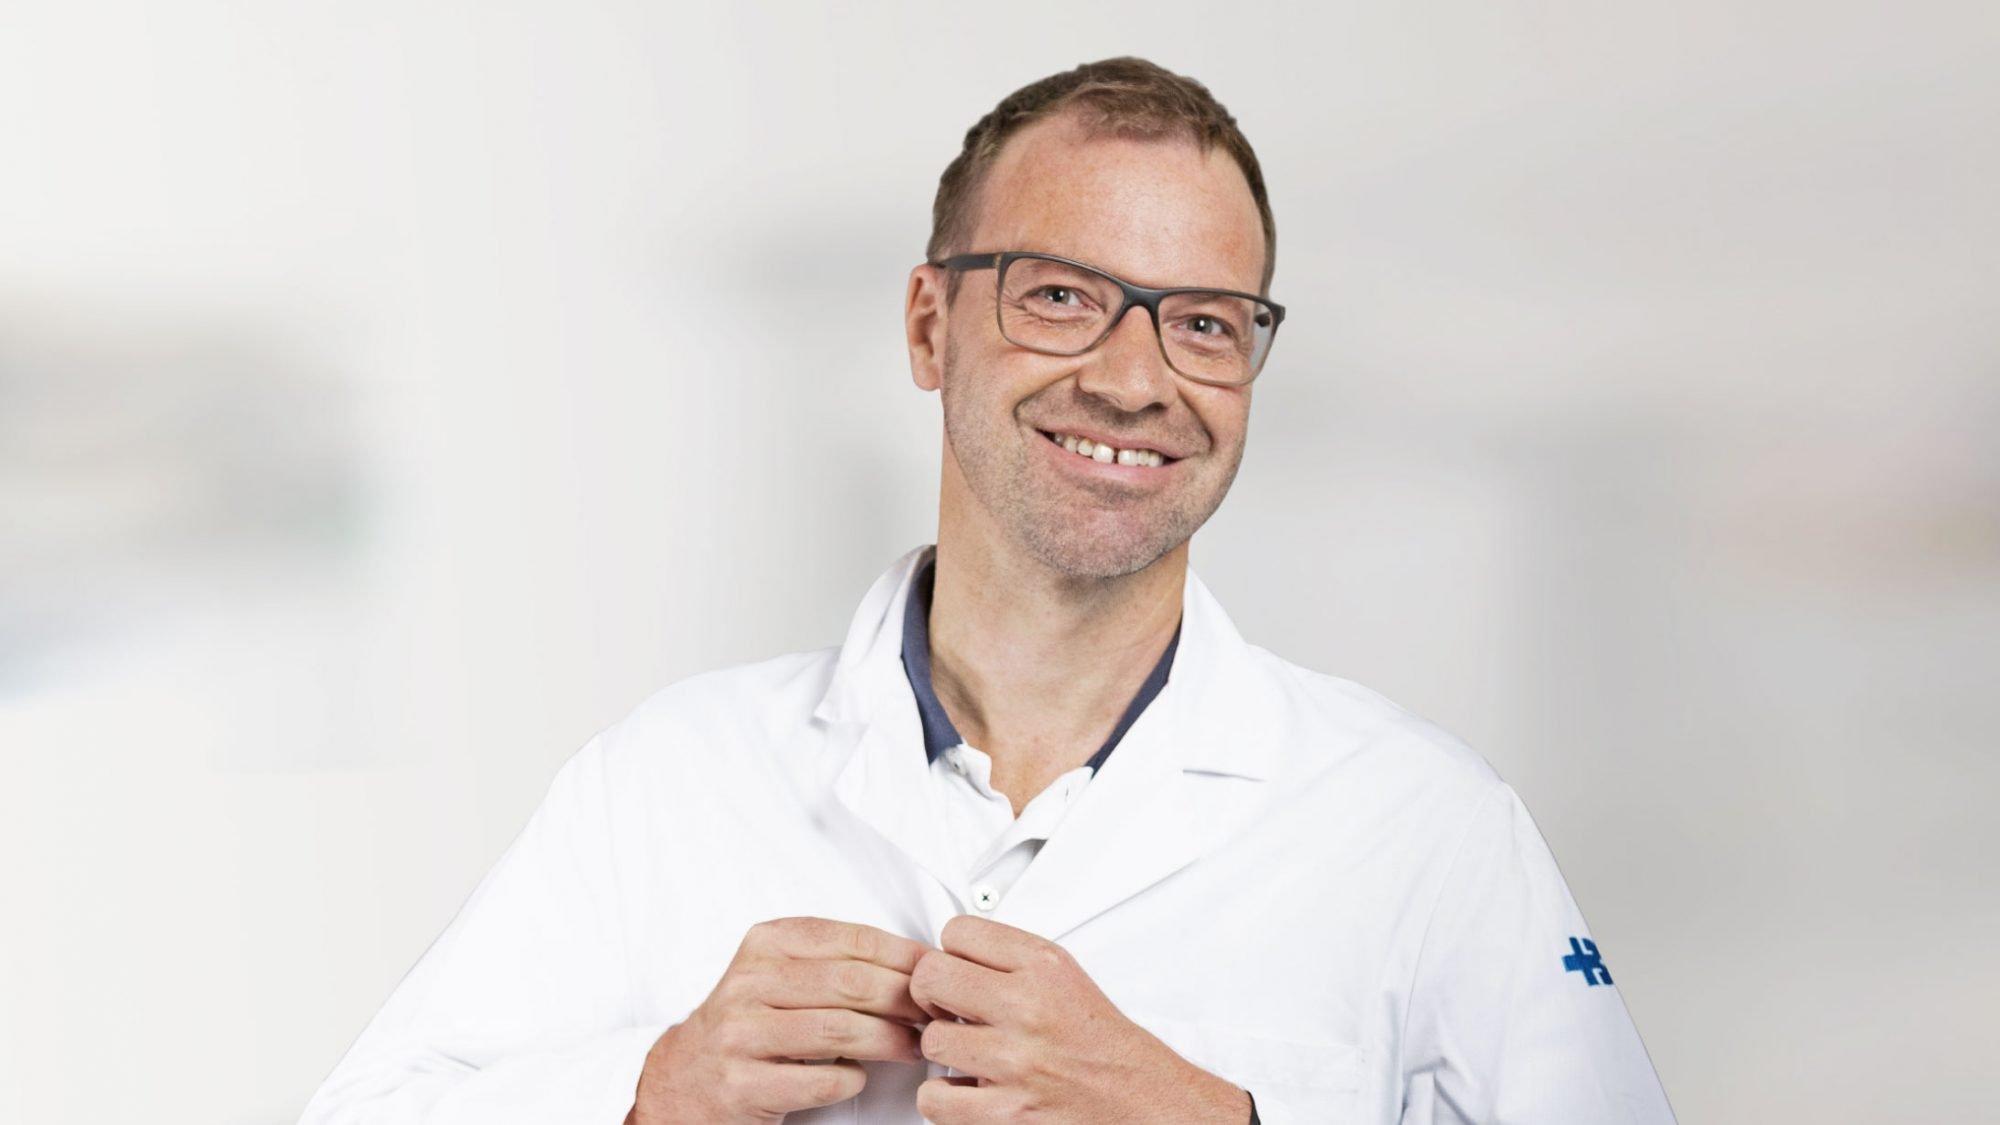 Matthias Froh, Gastroenterologe am KSB